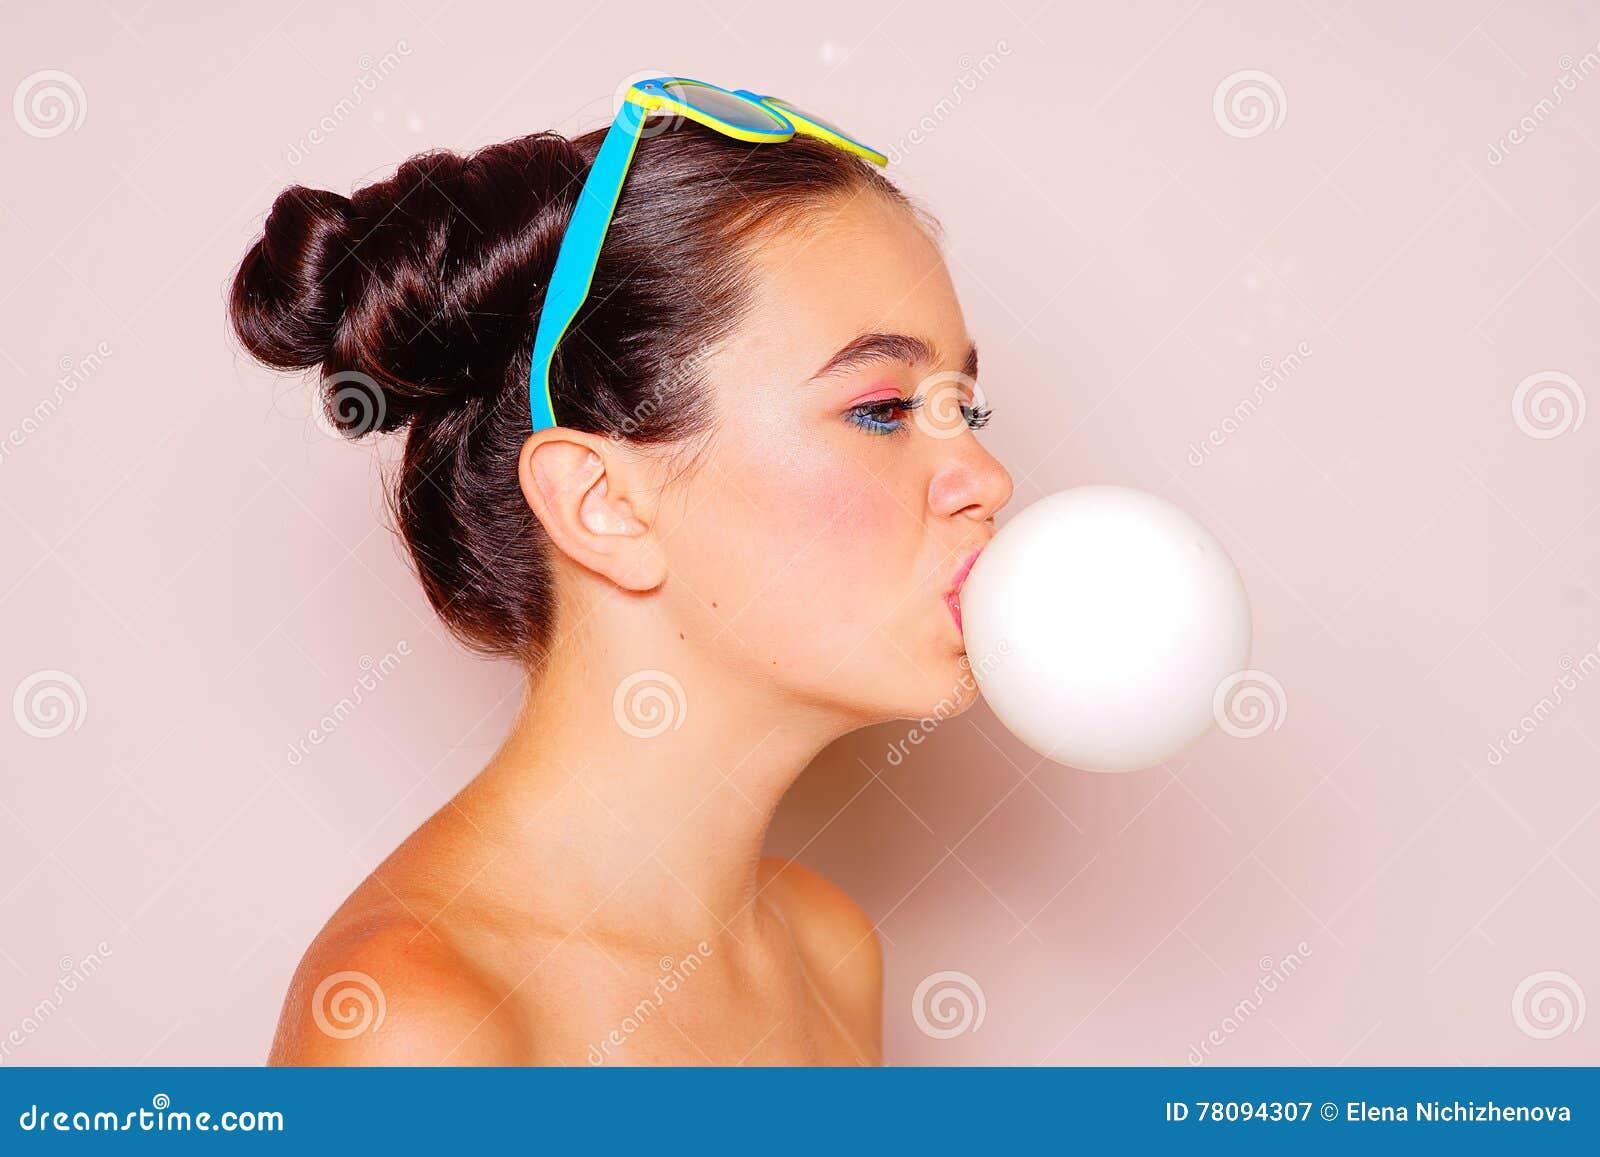 from Malaki gum blowing teen girls